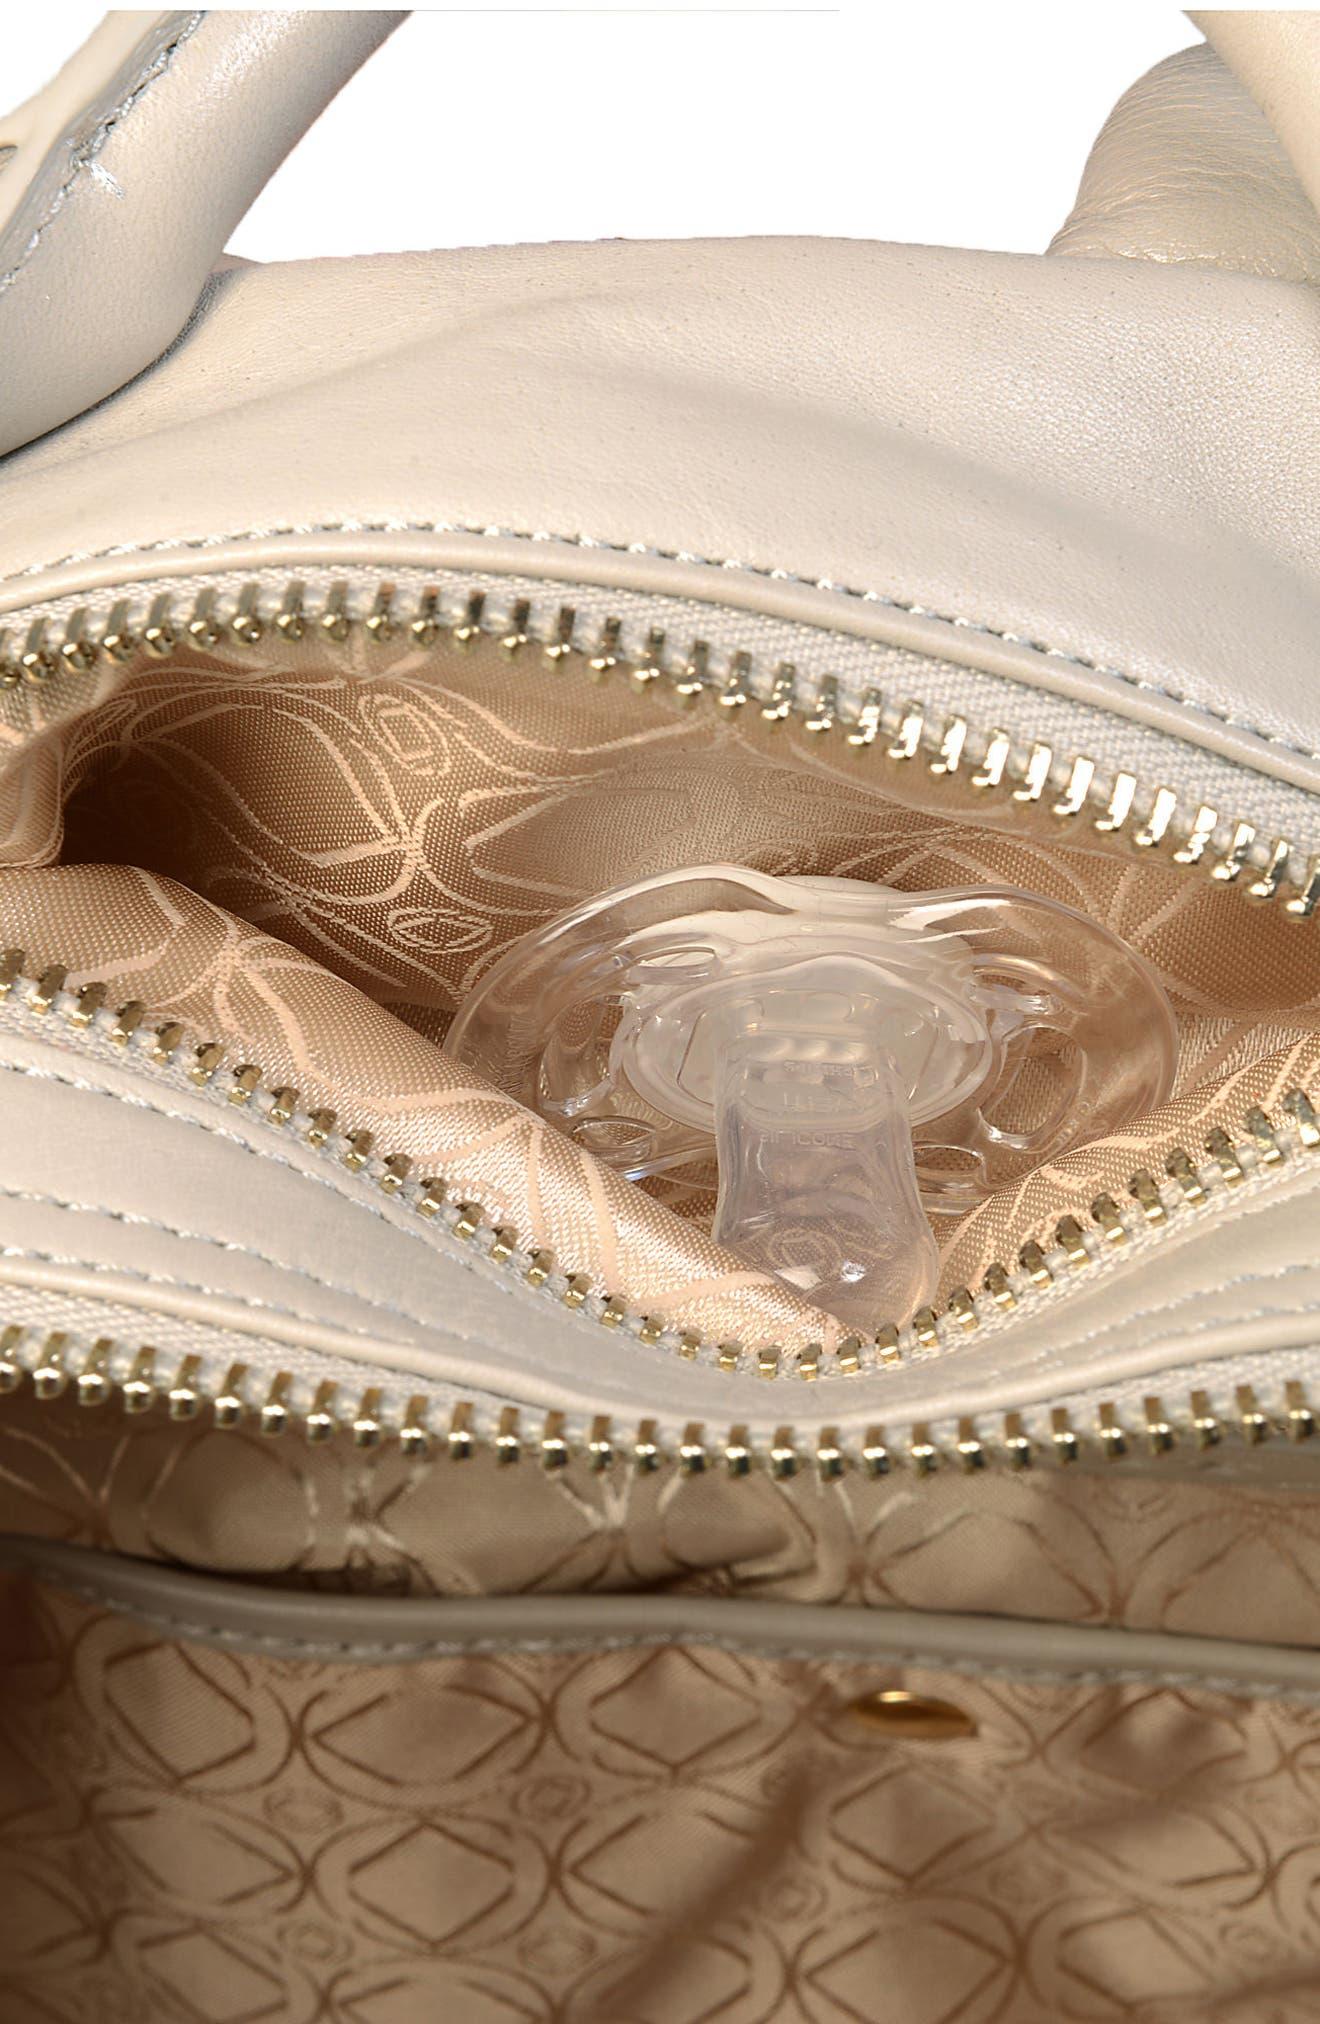 Joy XL Leather Backpack,                             Alternate thumbnail 14, color,                             Ice Grey